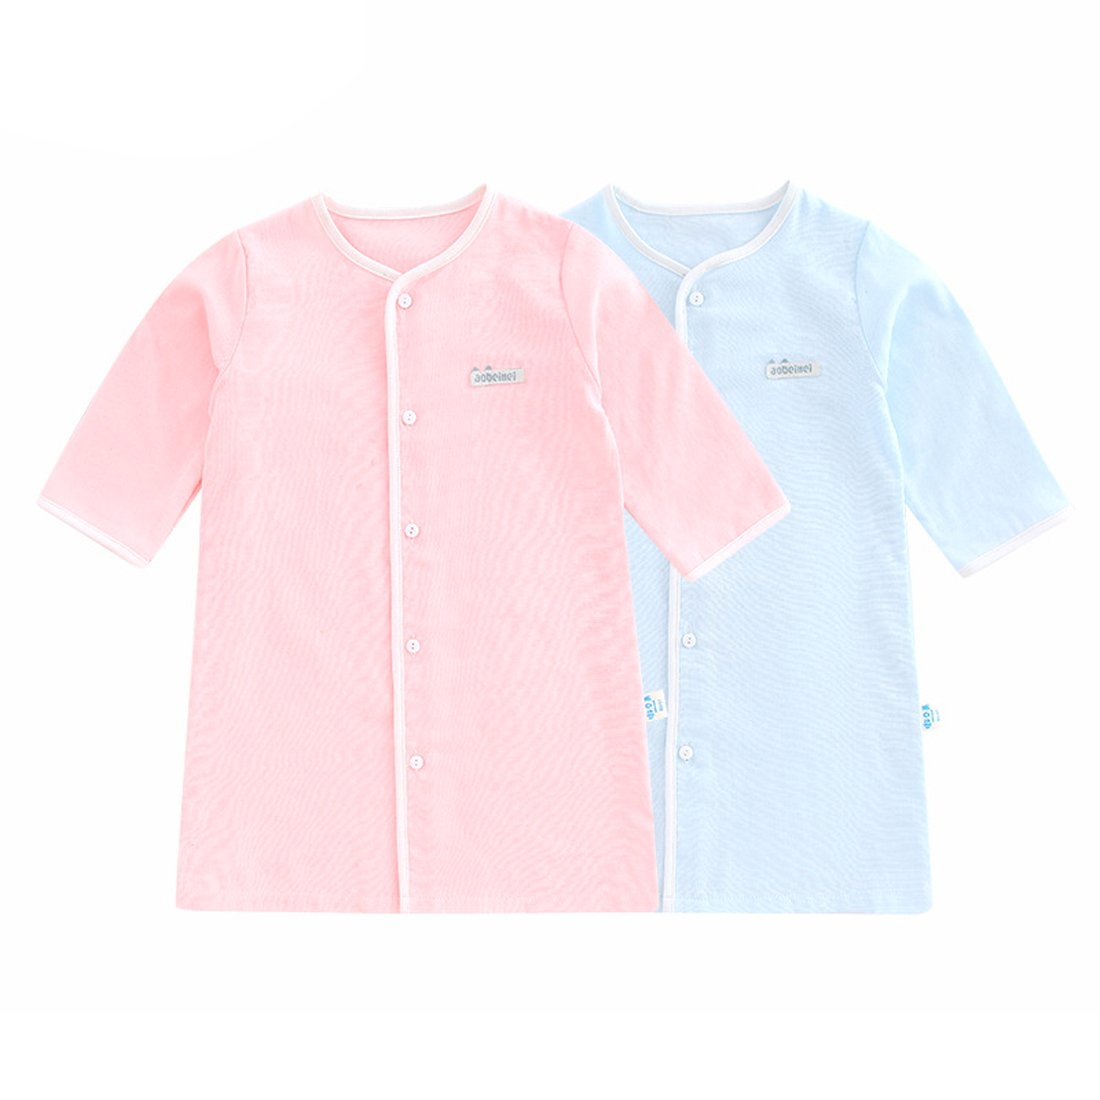 PAUBOLI Baby Nightgowns Bamboo Organic Cotton Wearable Snap Nightgown Infant Long Sleeve Pajamas